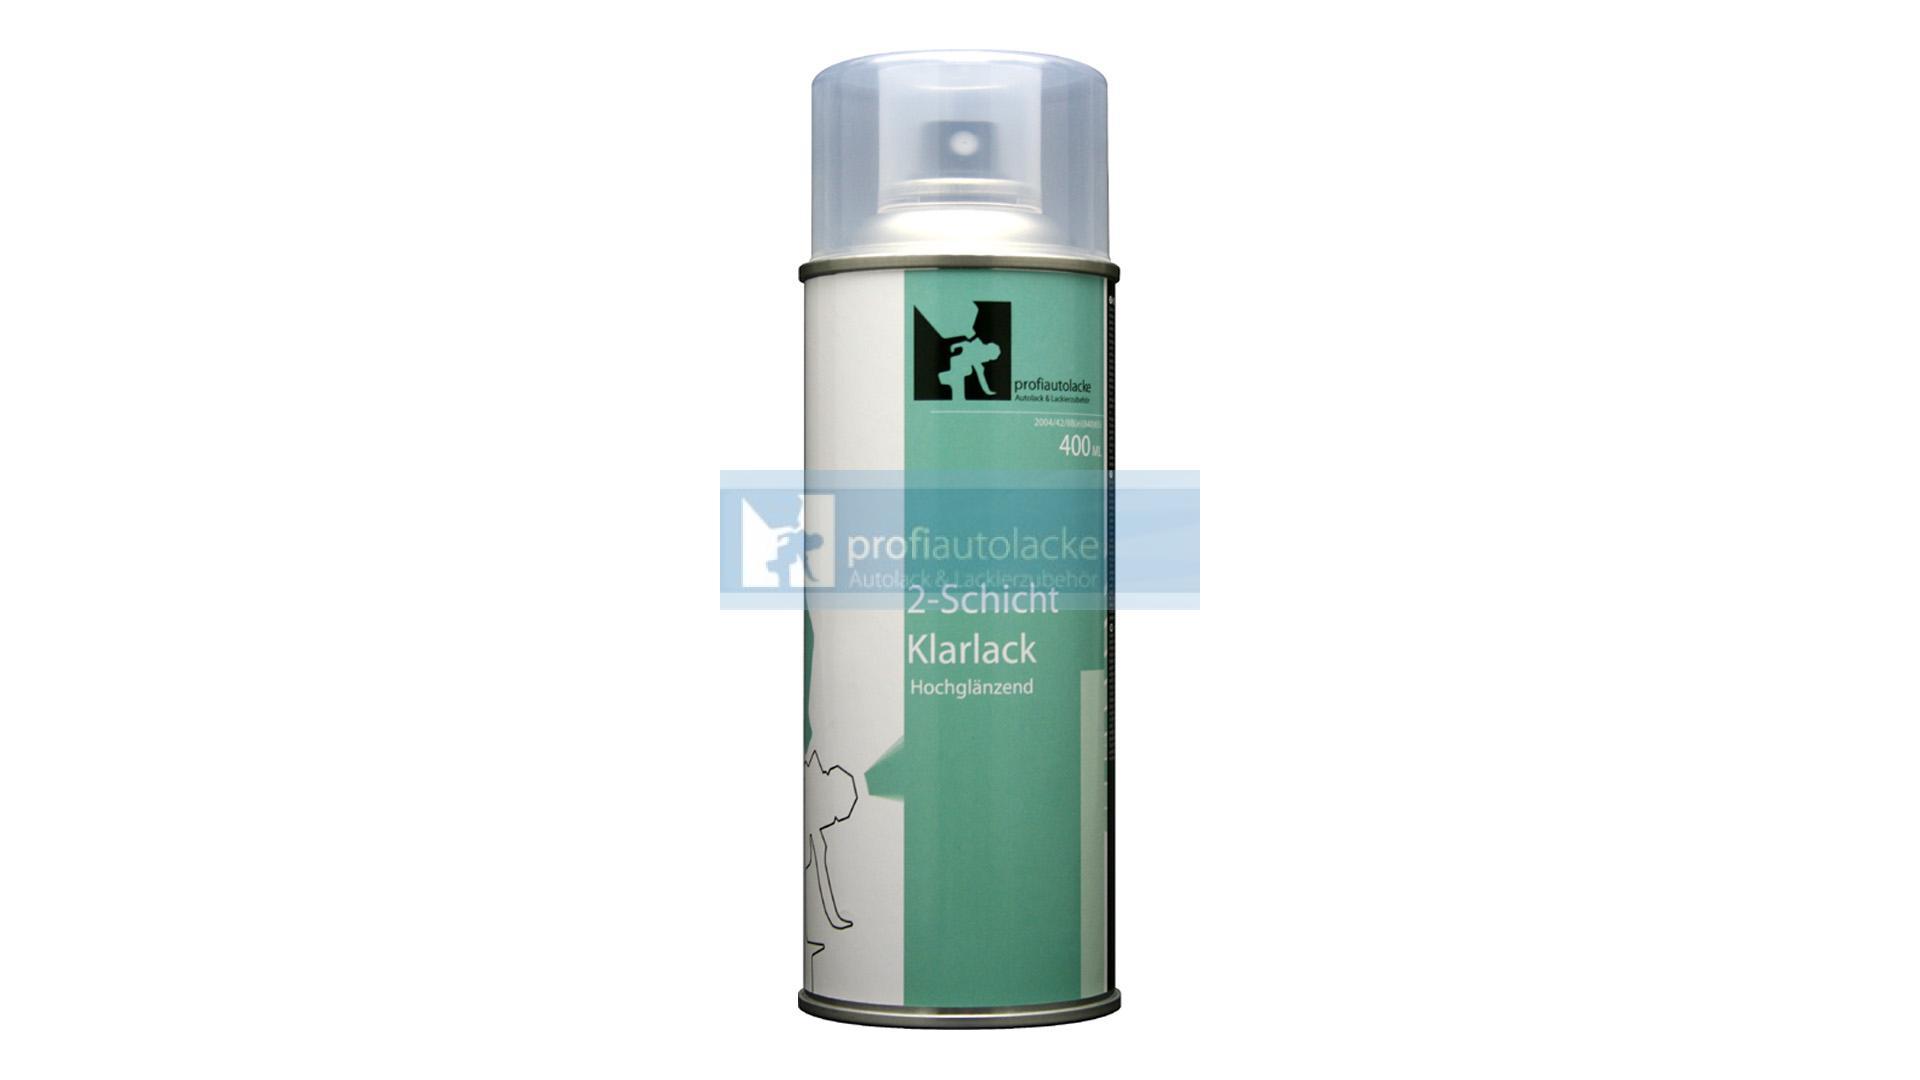 profiautolacke 2 schicht klarlack spraydose 400ml ebay. Black Bedroom Furniture Sets. Home Design Ideas